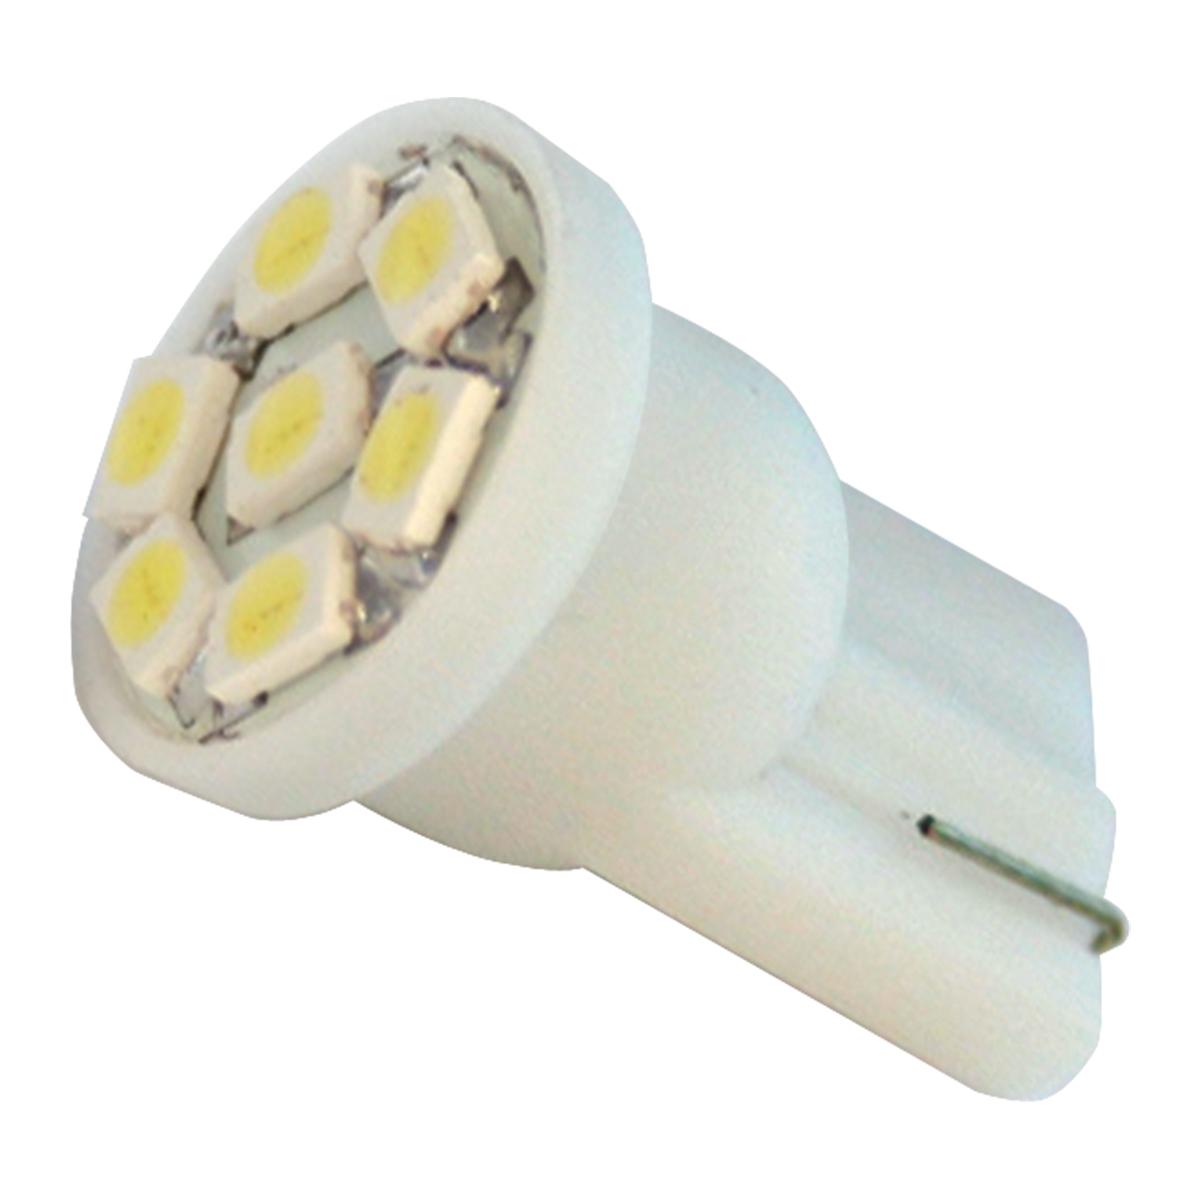 74904 White 194/168 Dome Type 7 LED Light Bulb